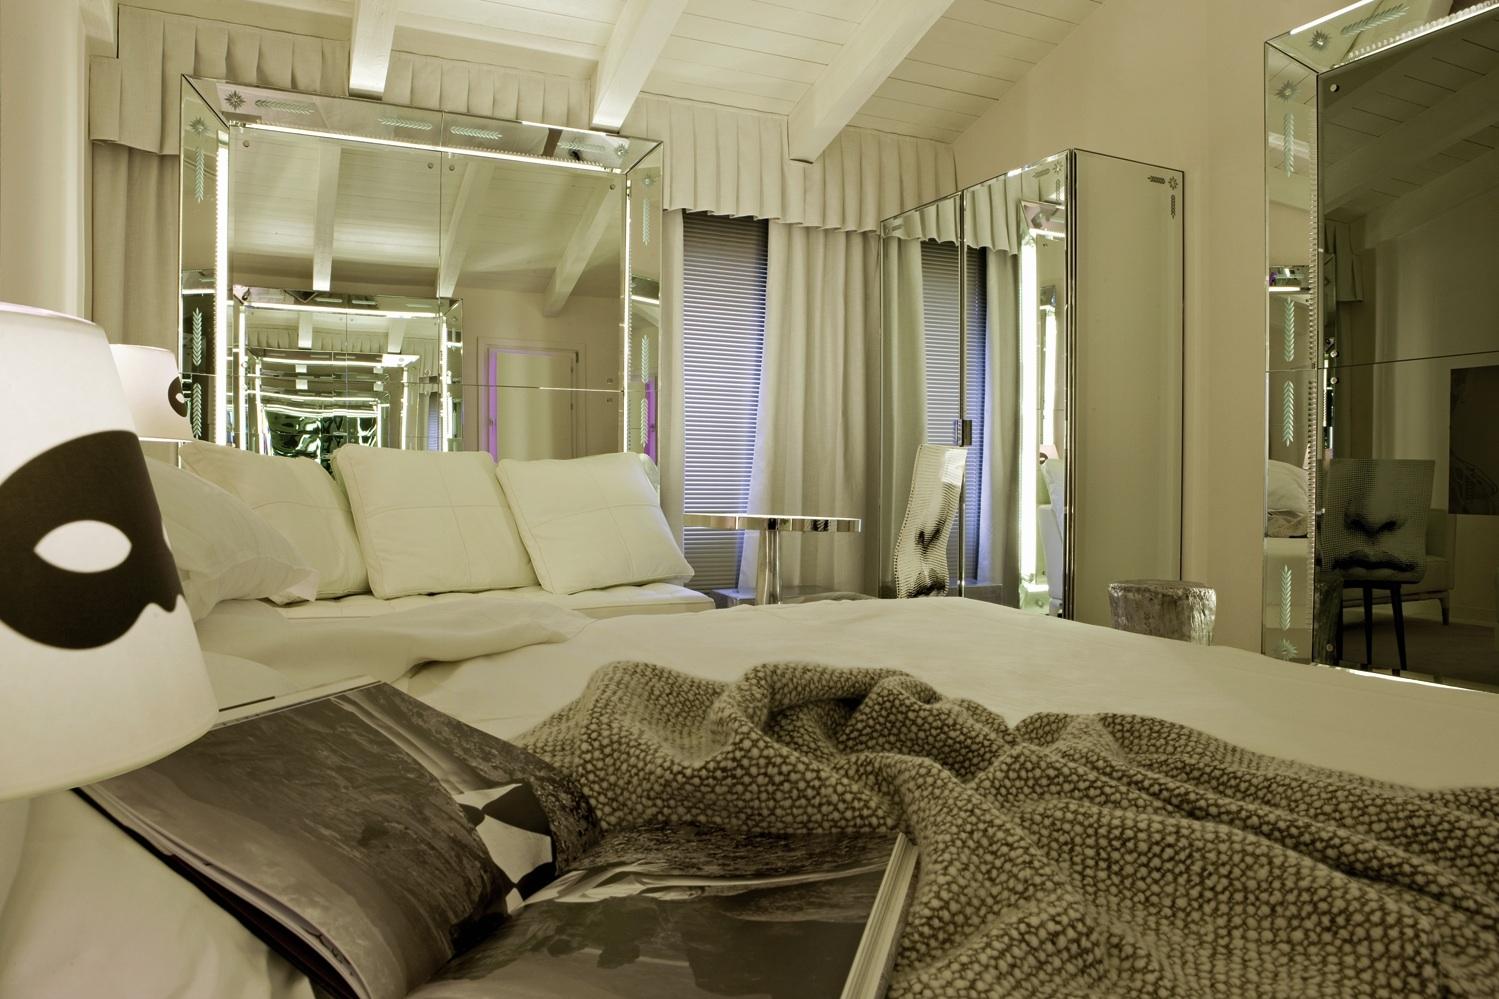 Maison Grace Philippe Starck Palazzina Grassi Hotel Venice